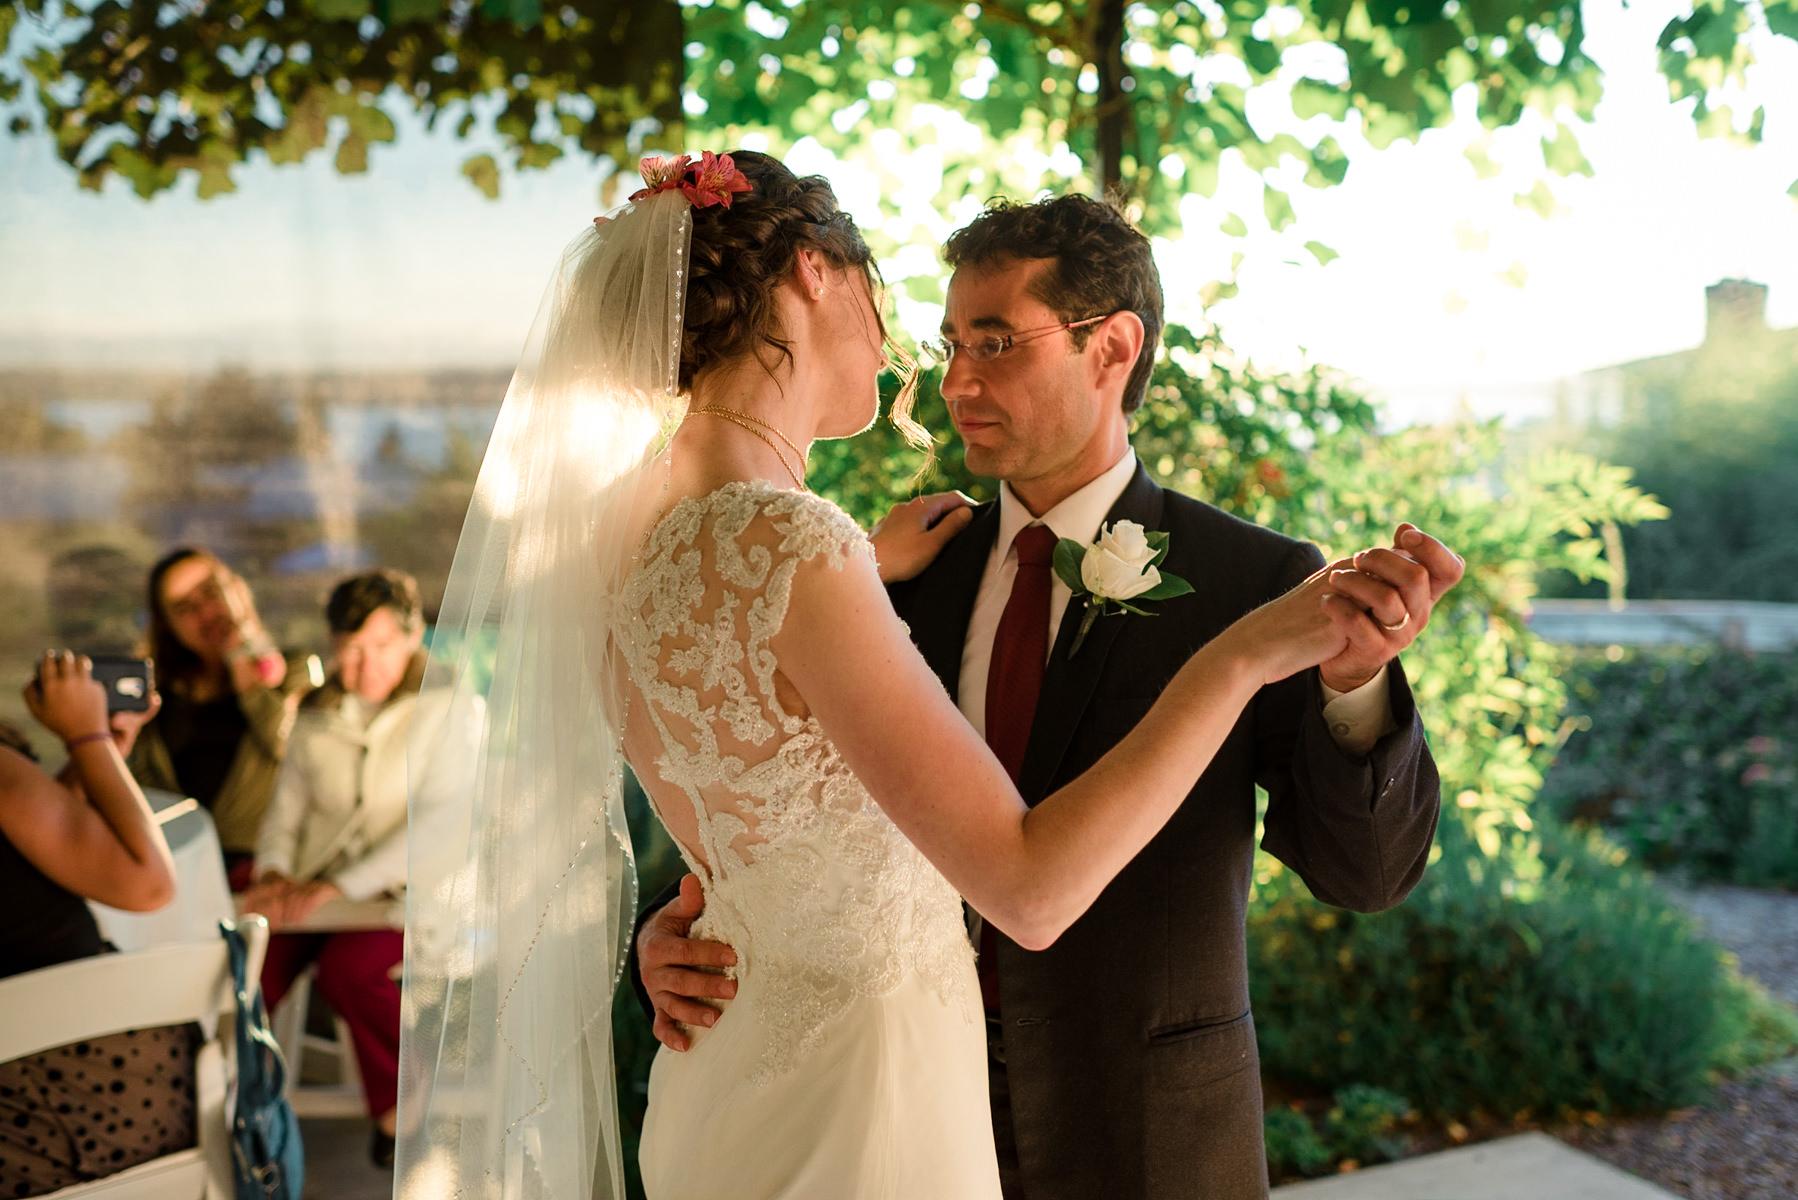 Andrew Tat - Documentary Wedding Photography - Kirkland, Washington - Emily & Cuauh - 44.JPG